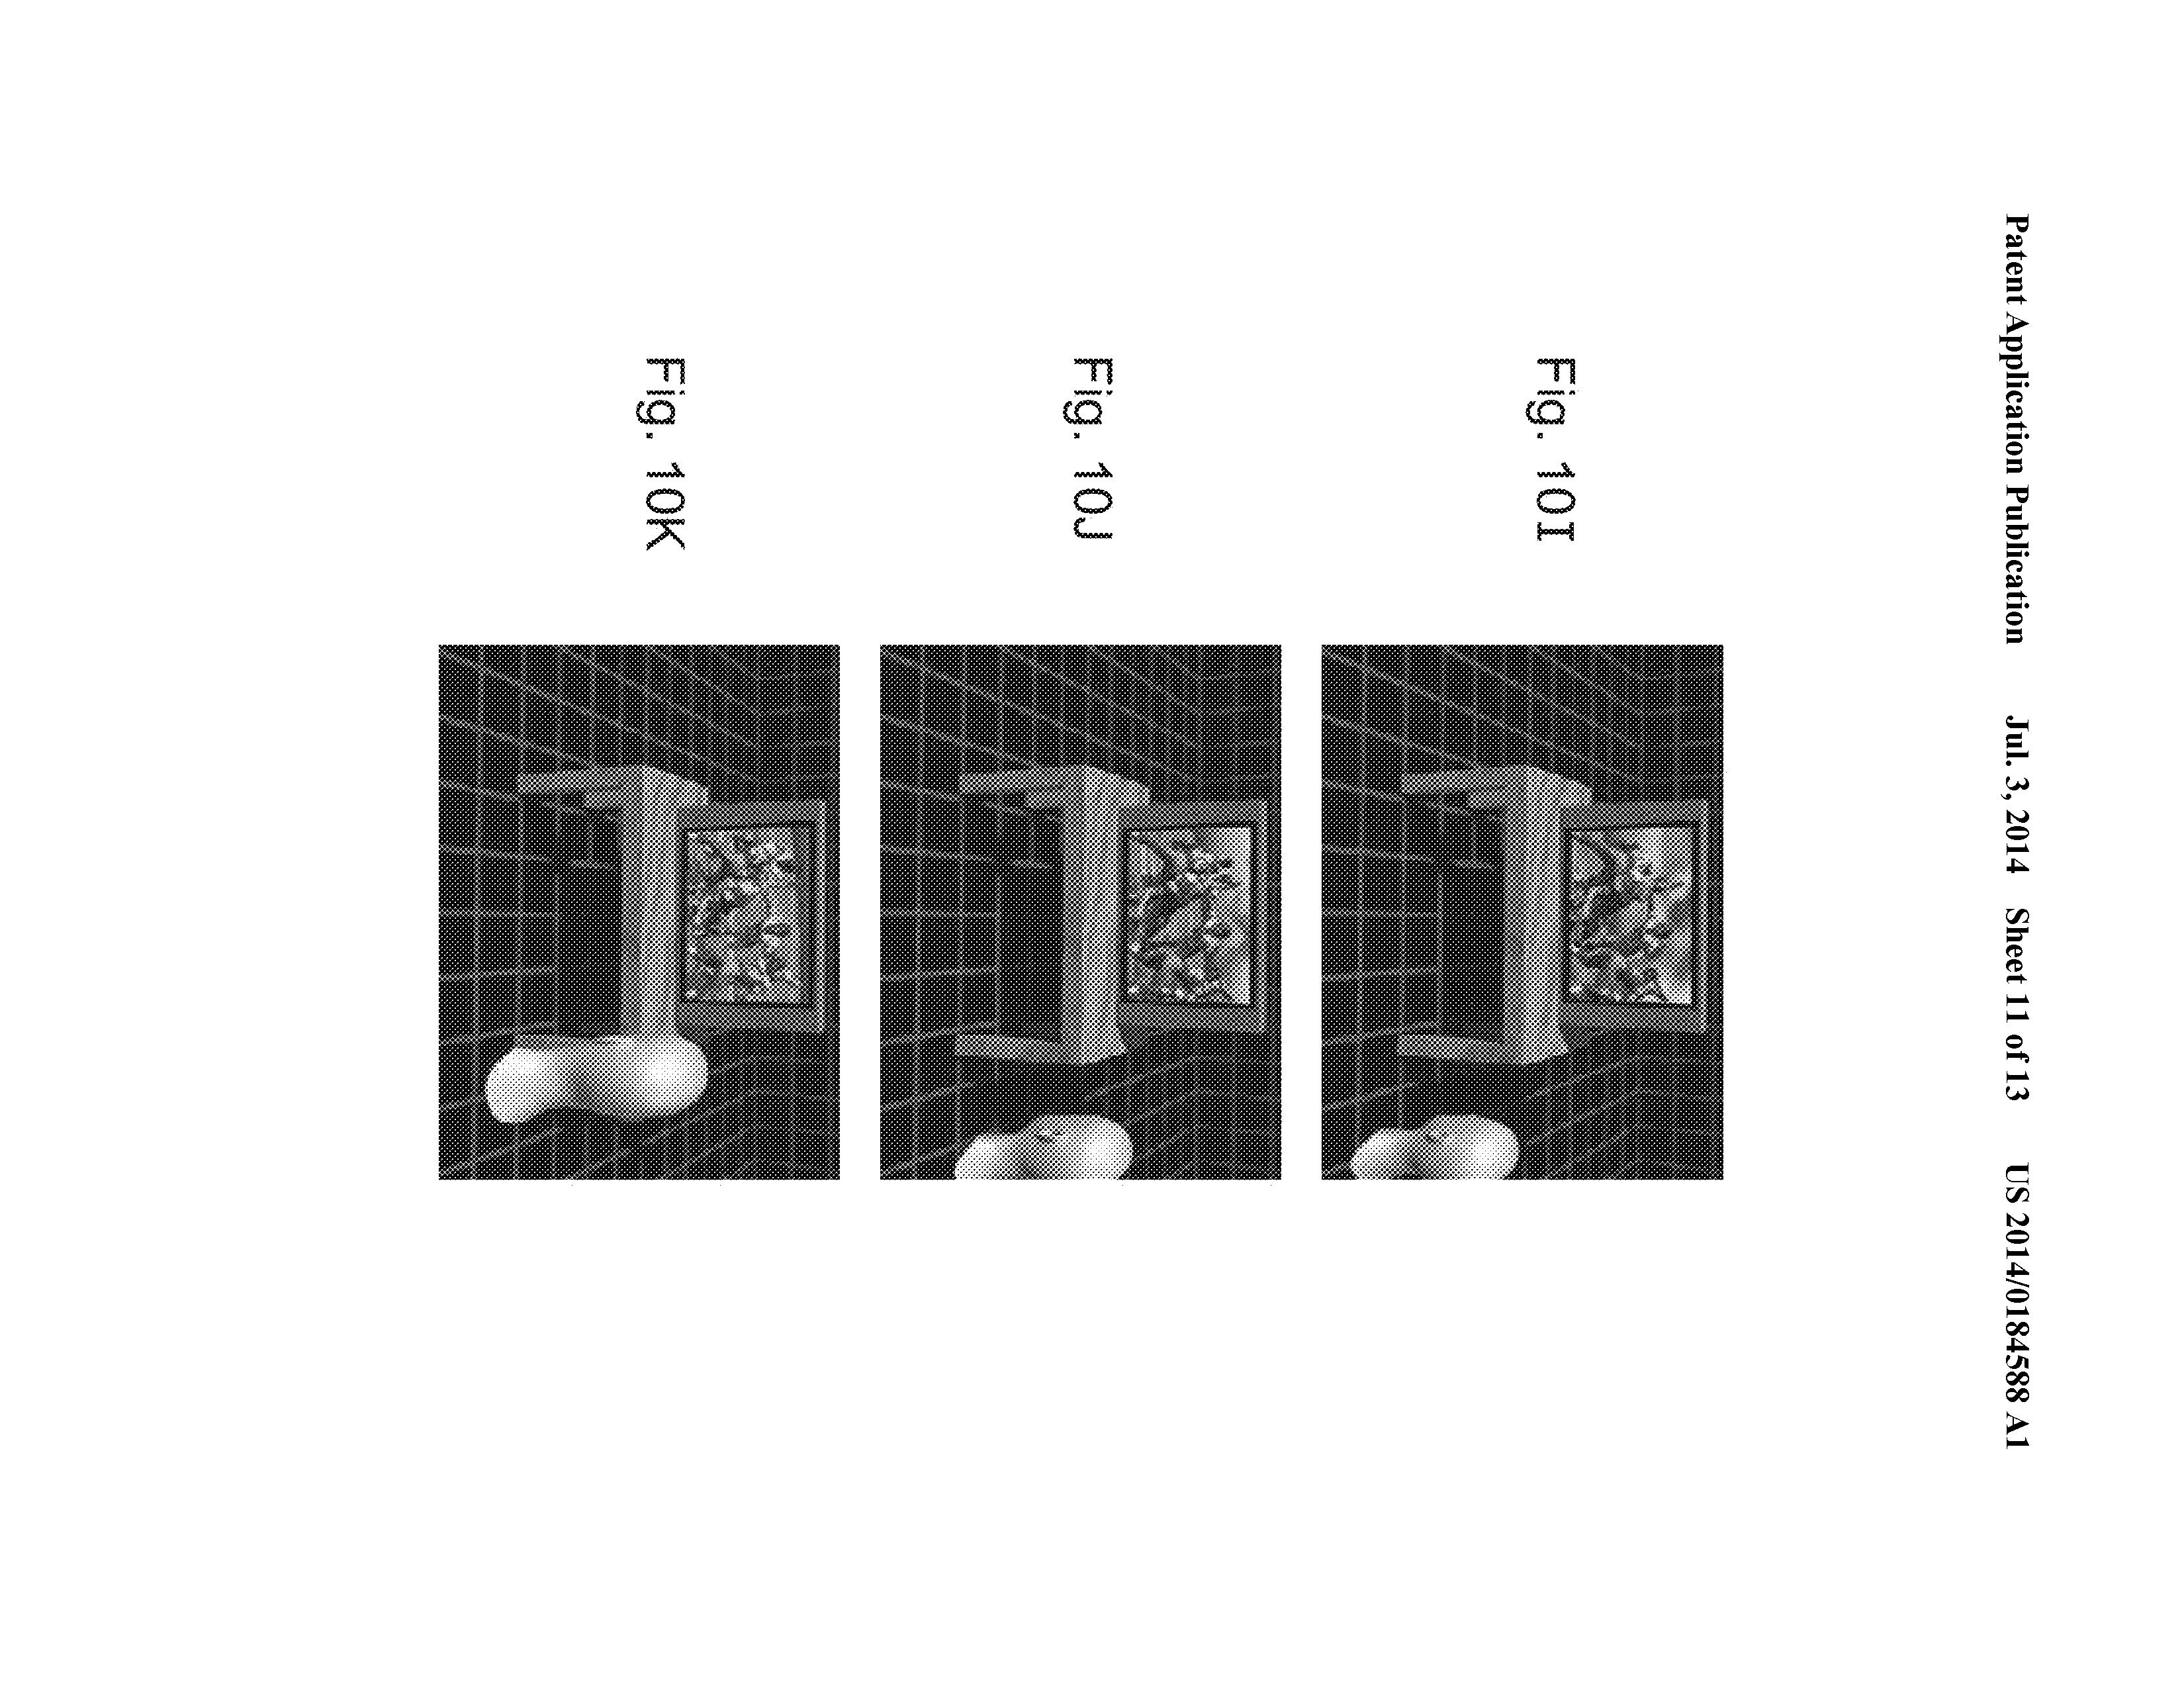 nintendo-eye-patent-11